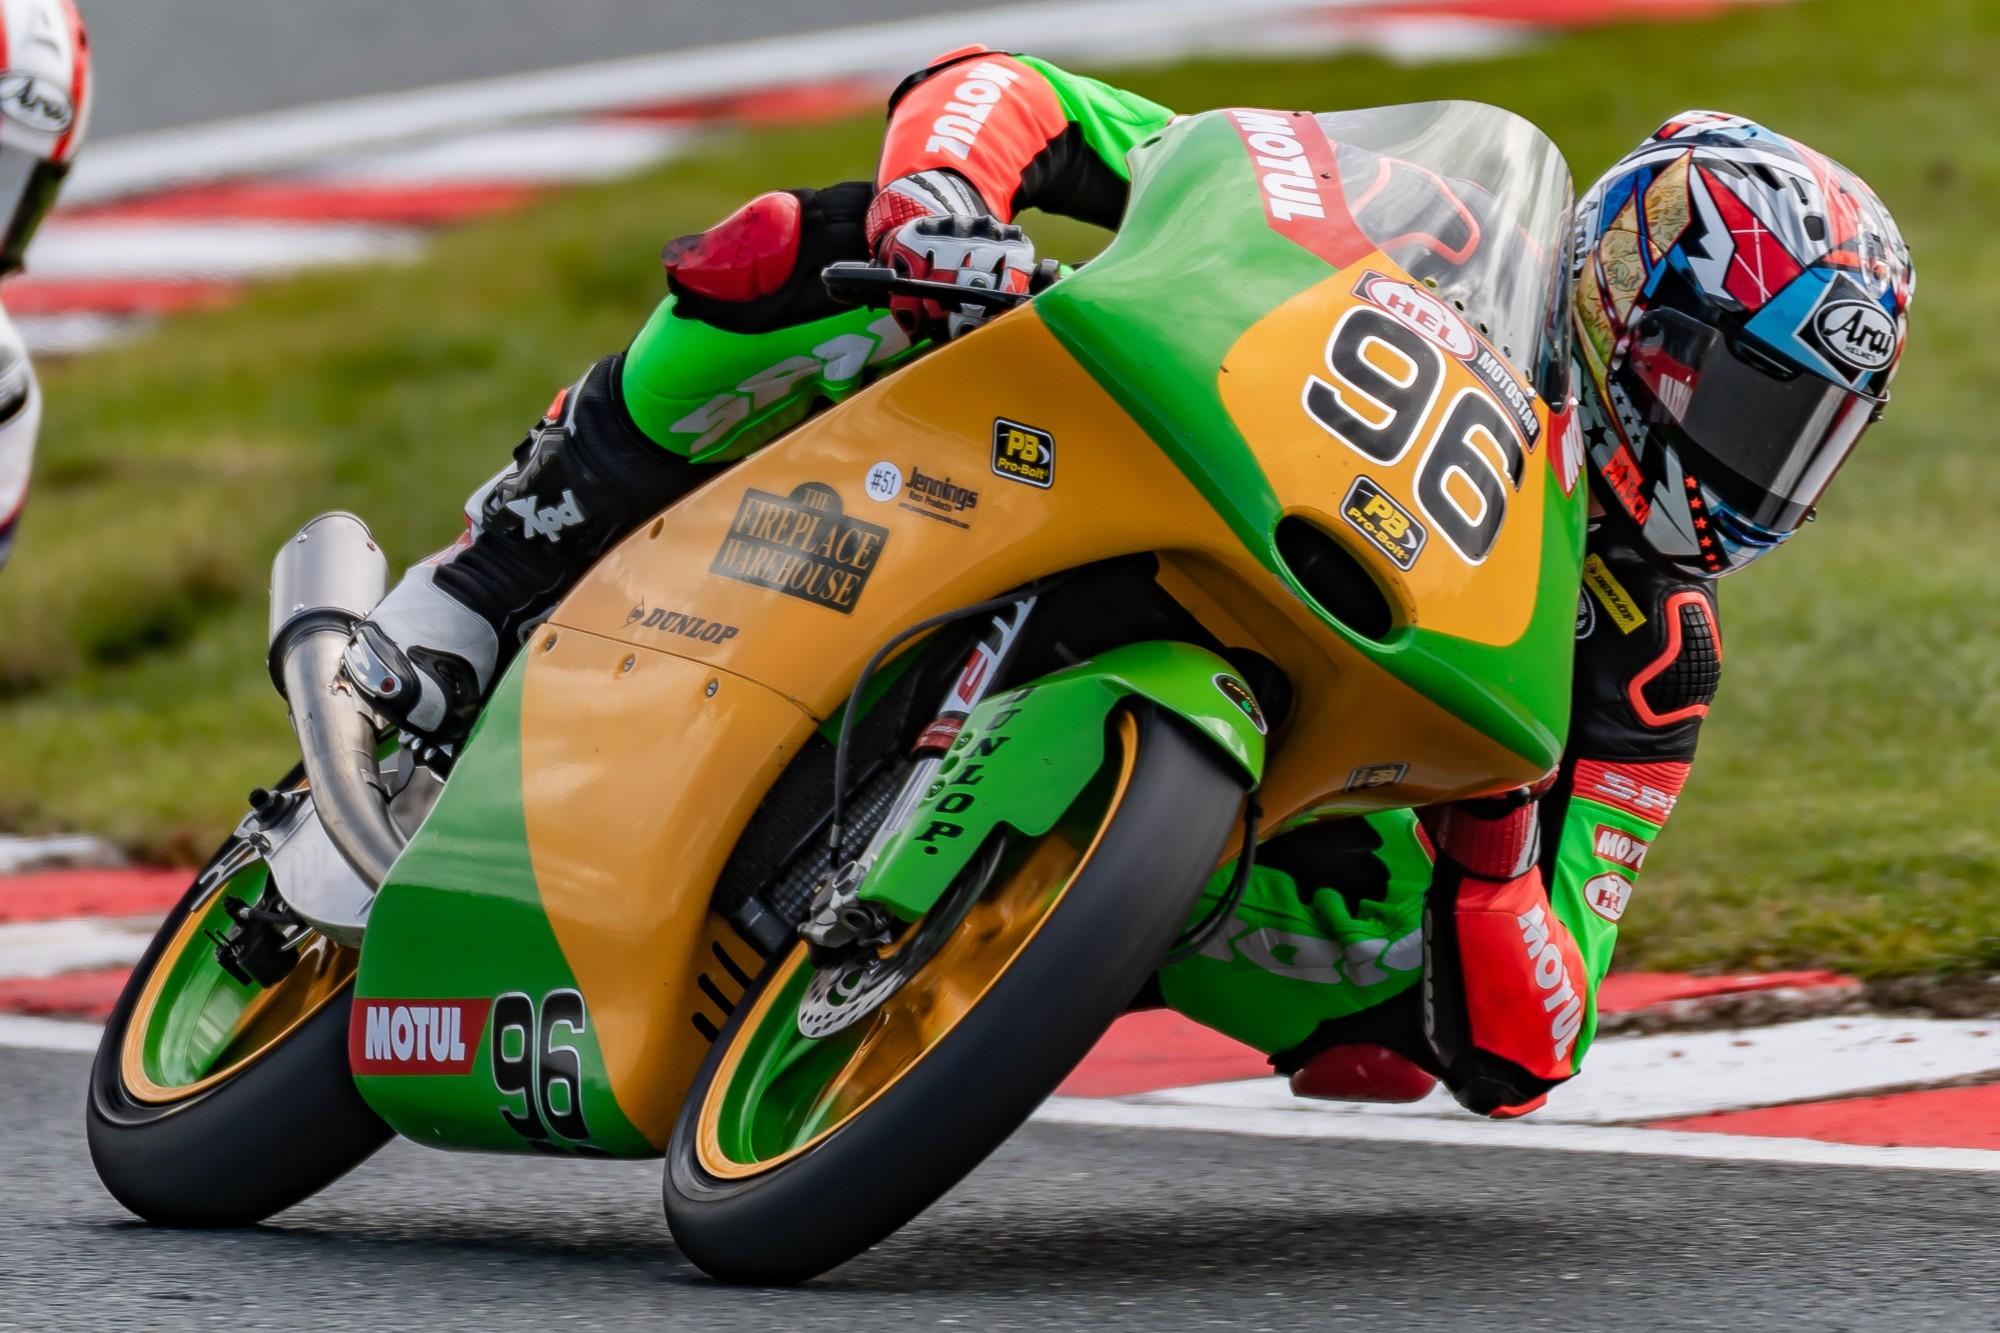 Moto3 World Championship: American Brandon Paasch To Race As Wild Card At  Silverstone - Roadracing World Magazine | Motorcycle Riding, Racing & Tech  News